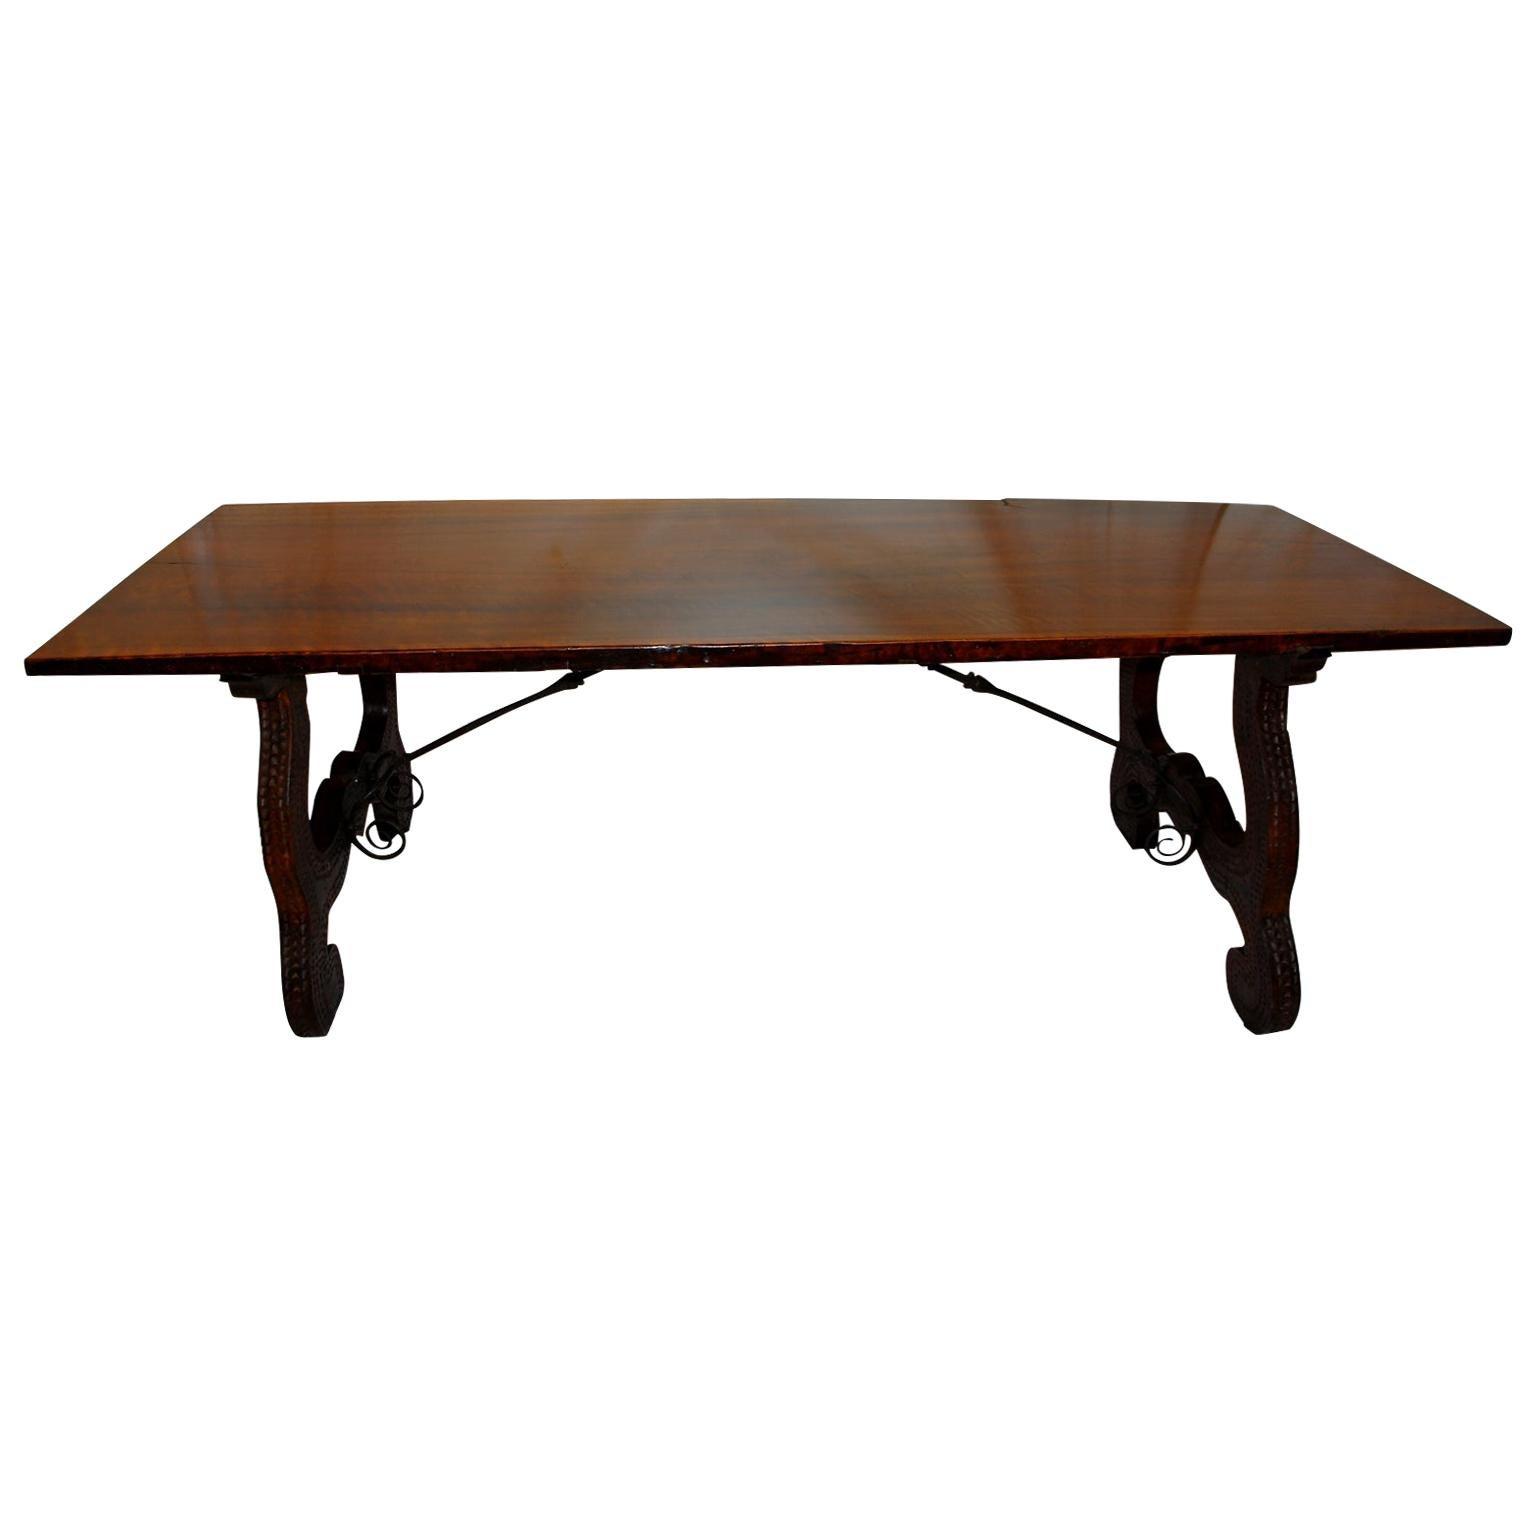 Italian 18th Century Walnut Refectory Table with Single Board Top